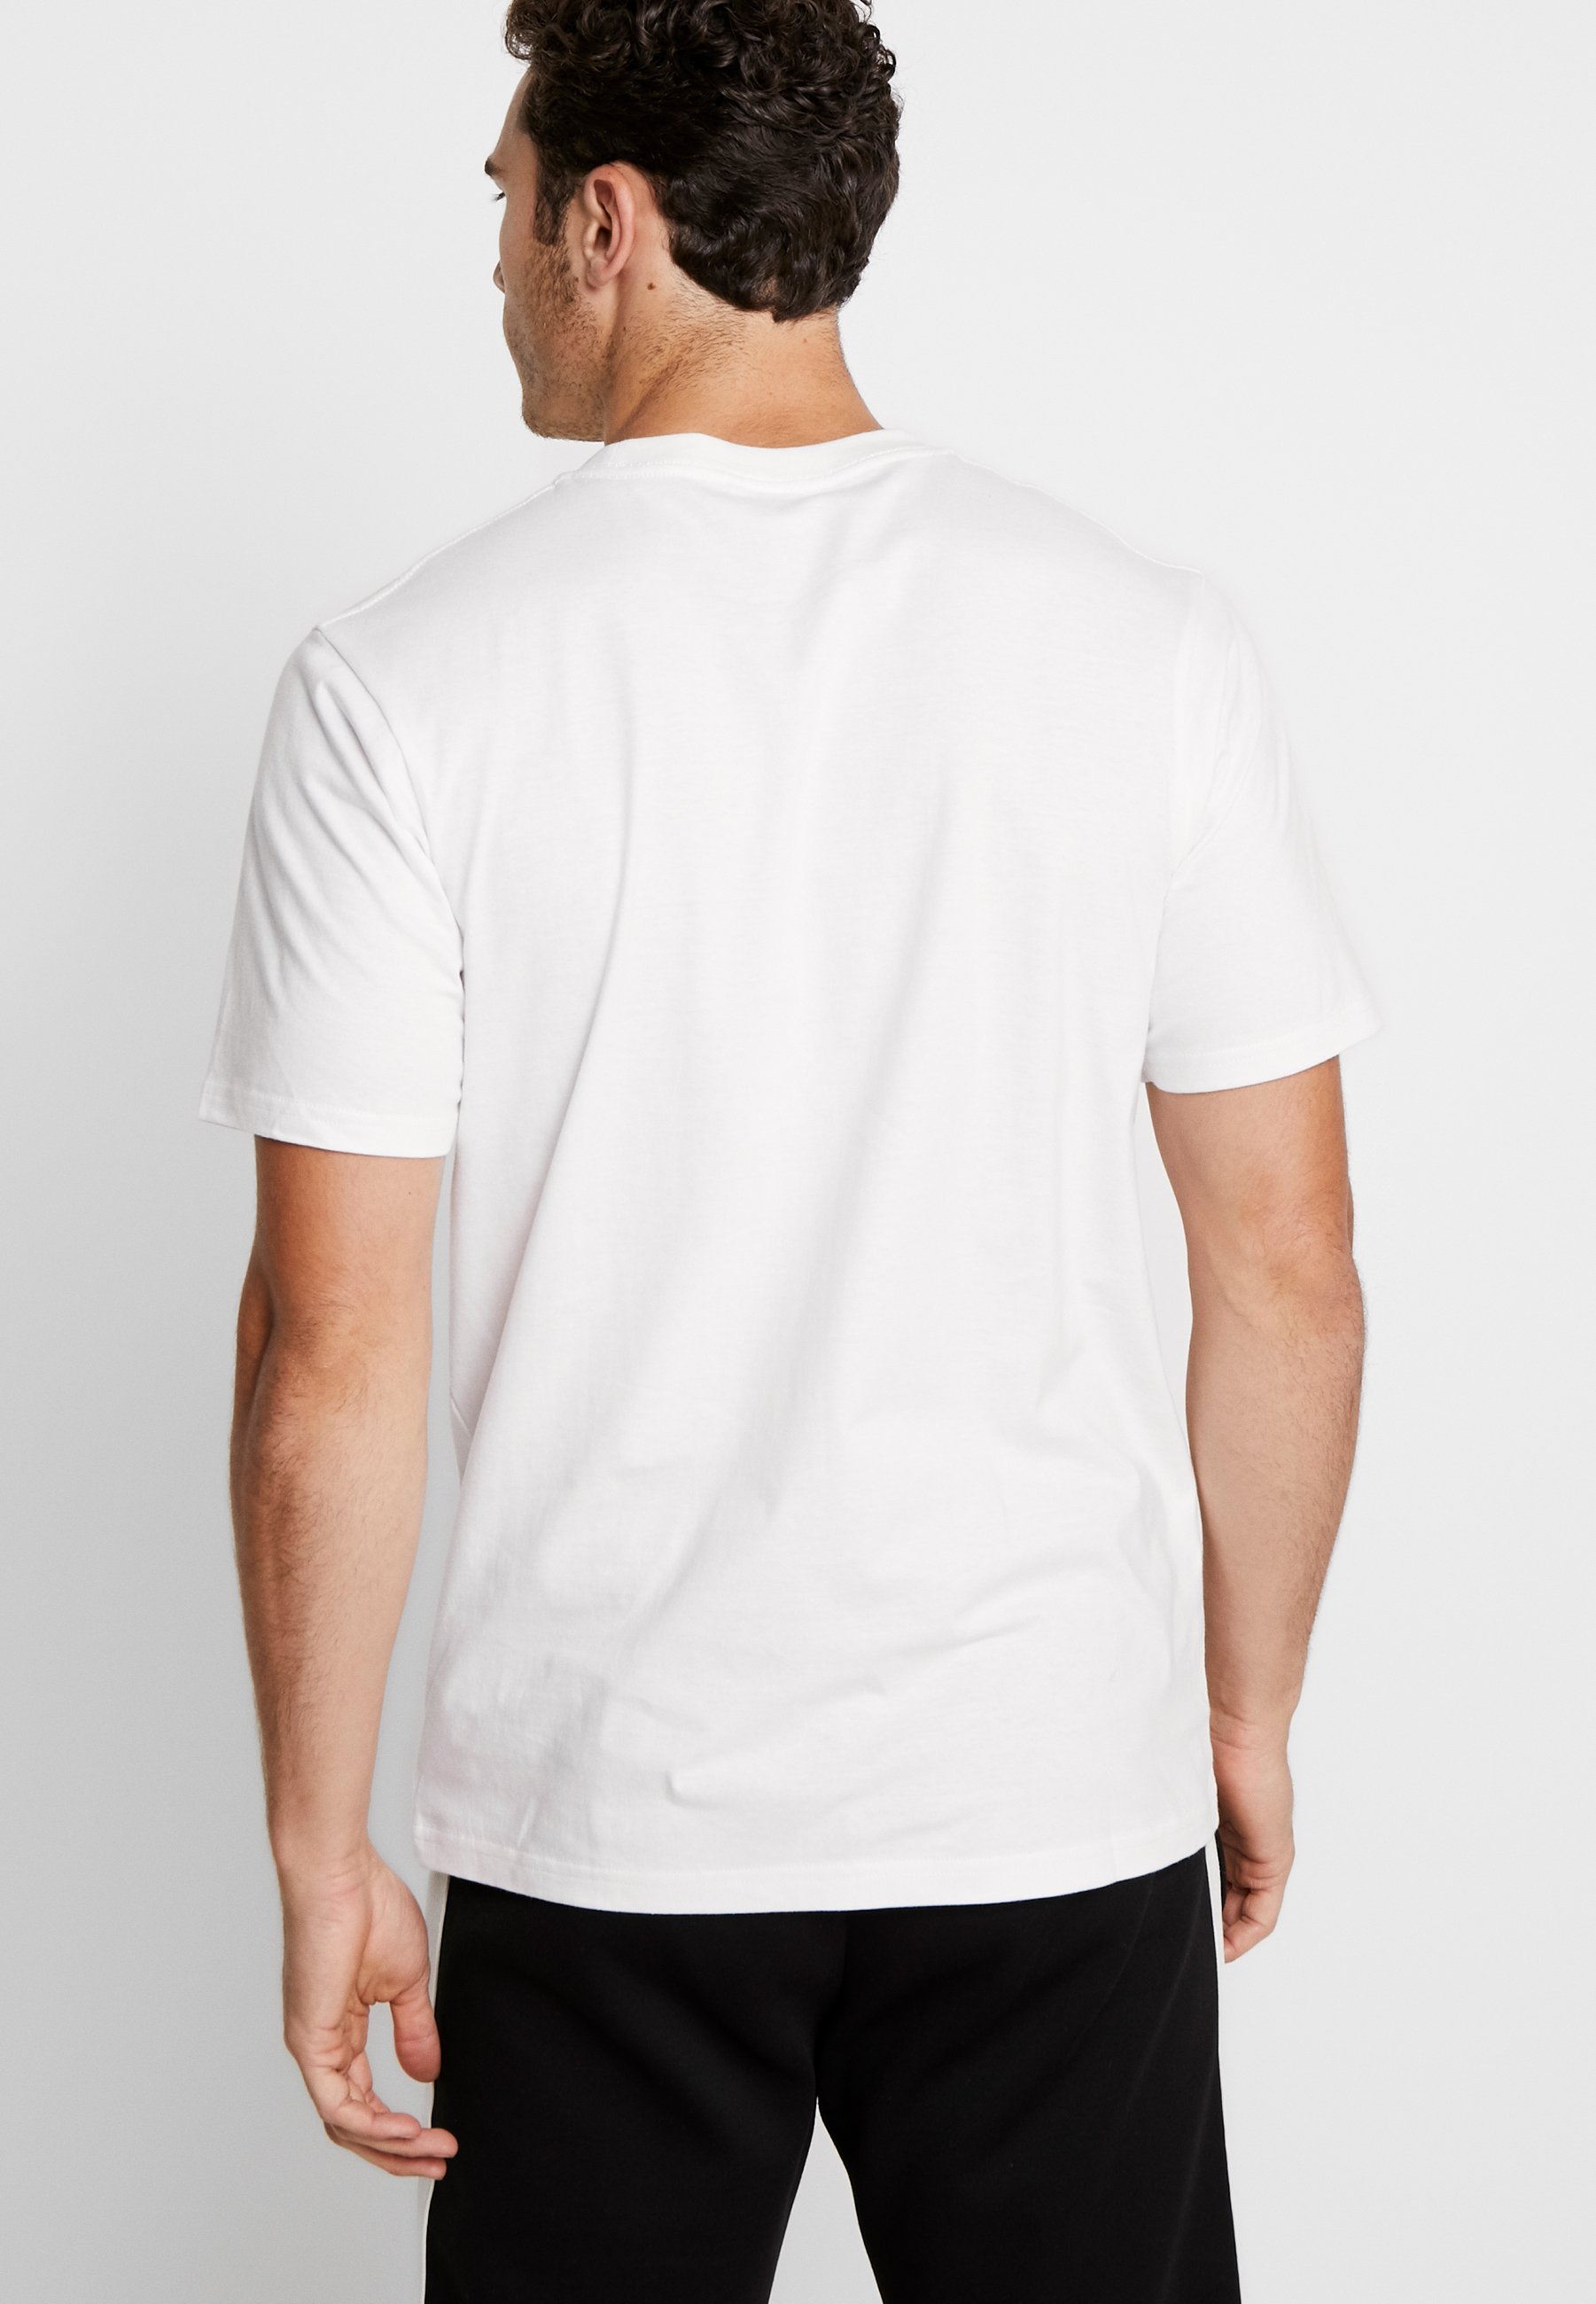 shirt playoff SportT Tbar Vintage Series White Imprimé Cotton On kuiXPZ